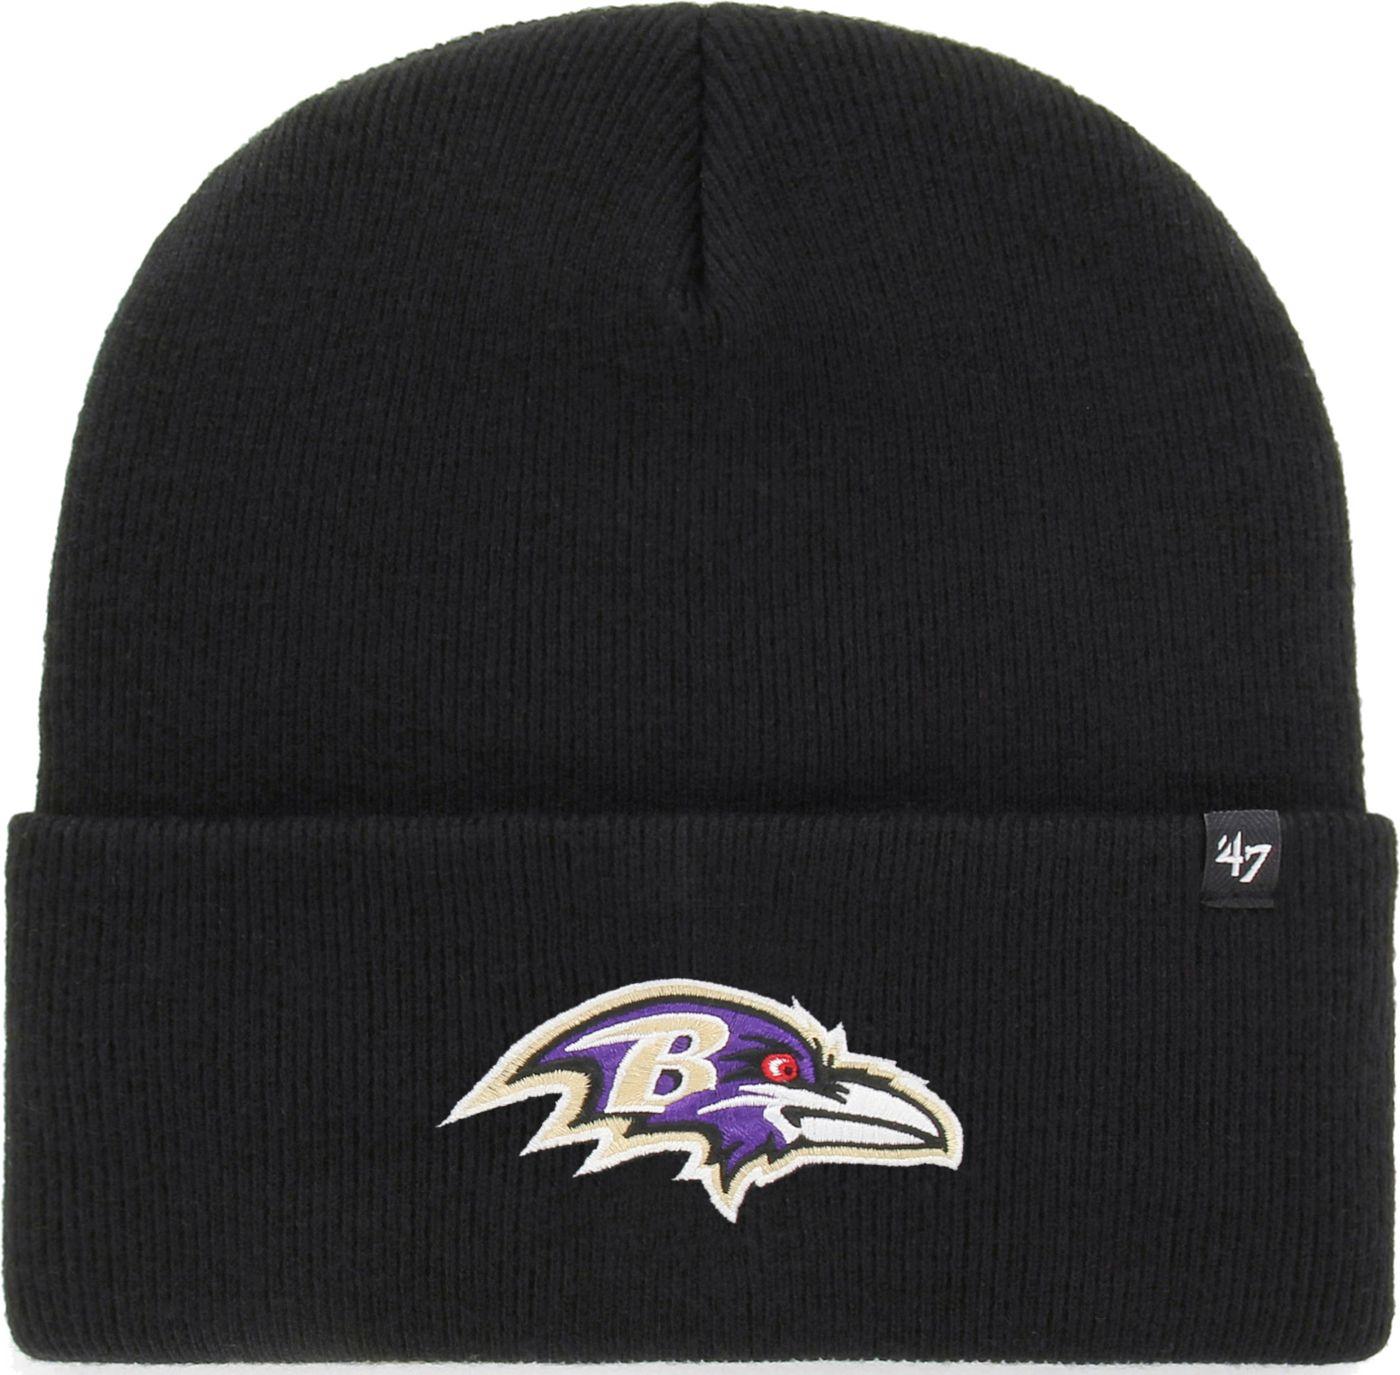 '47 Men's Baltimore Ravens Carhartt Black Knit Hat